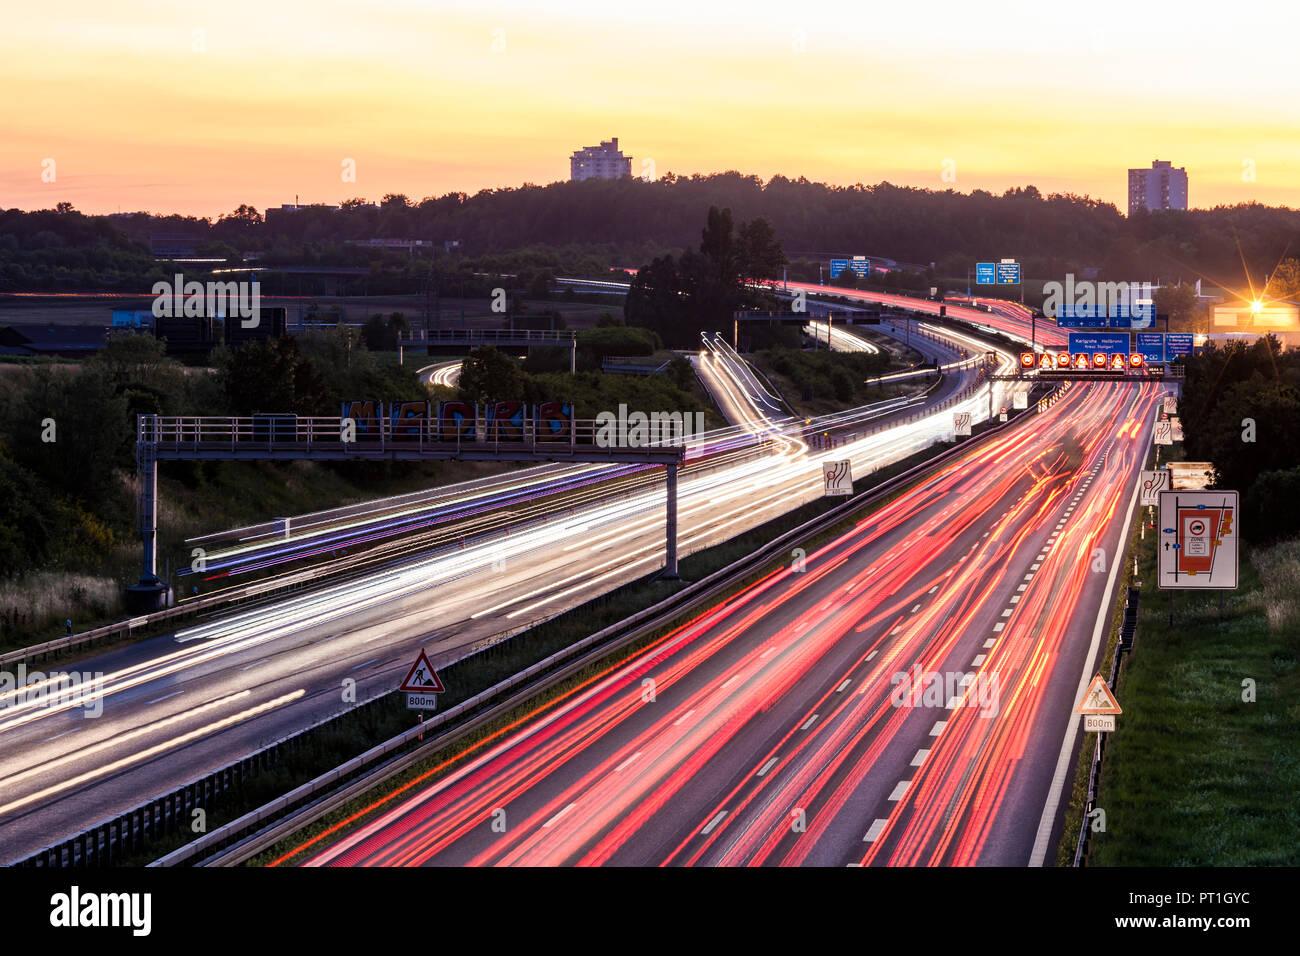 Germany, Baden-Wuerttemberg, Stuttgart, Autobahn A8 in the evening, light trails - Stock Image